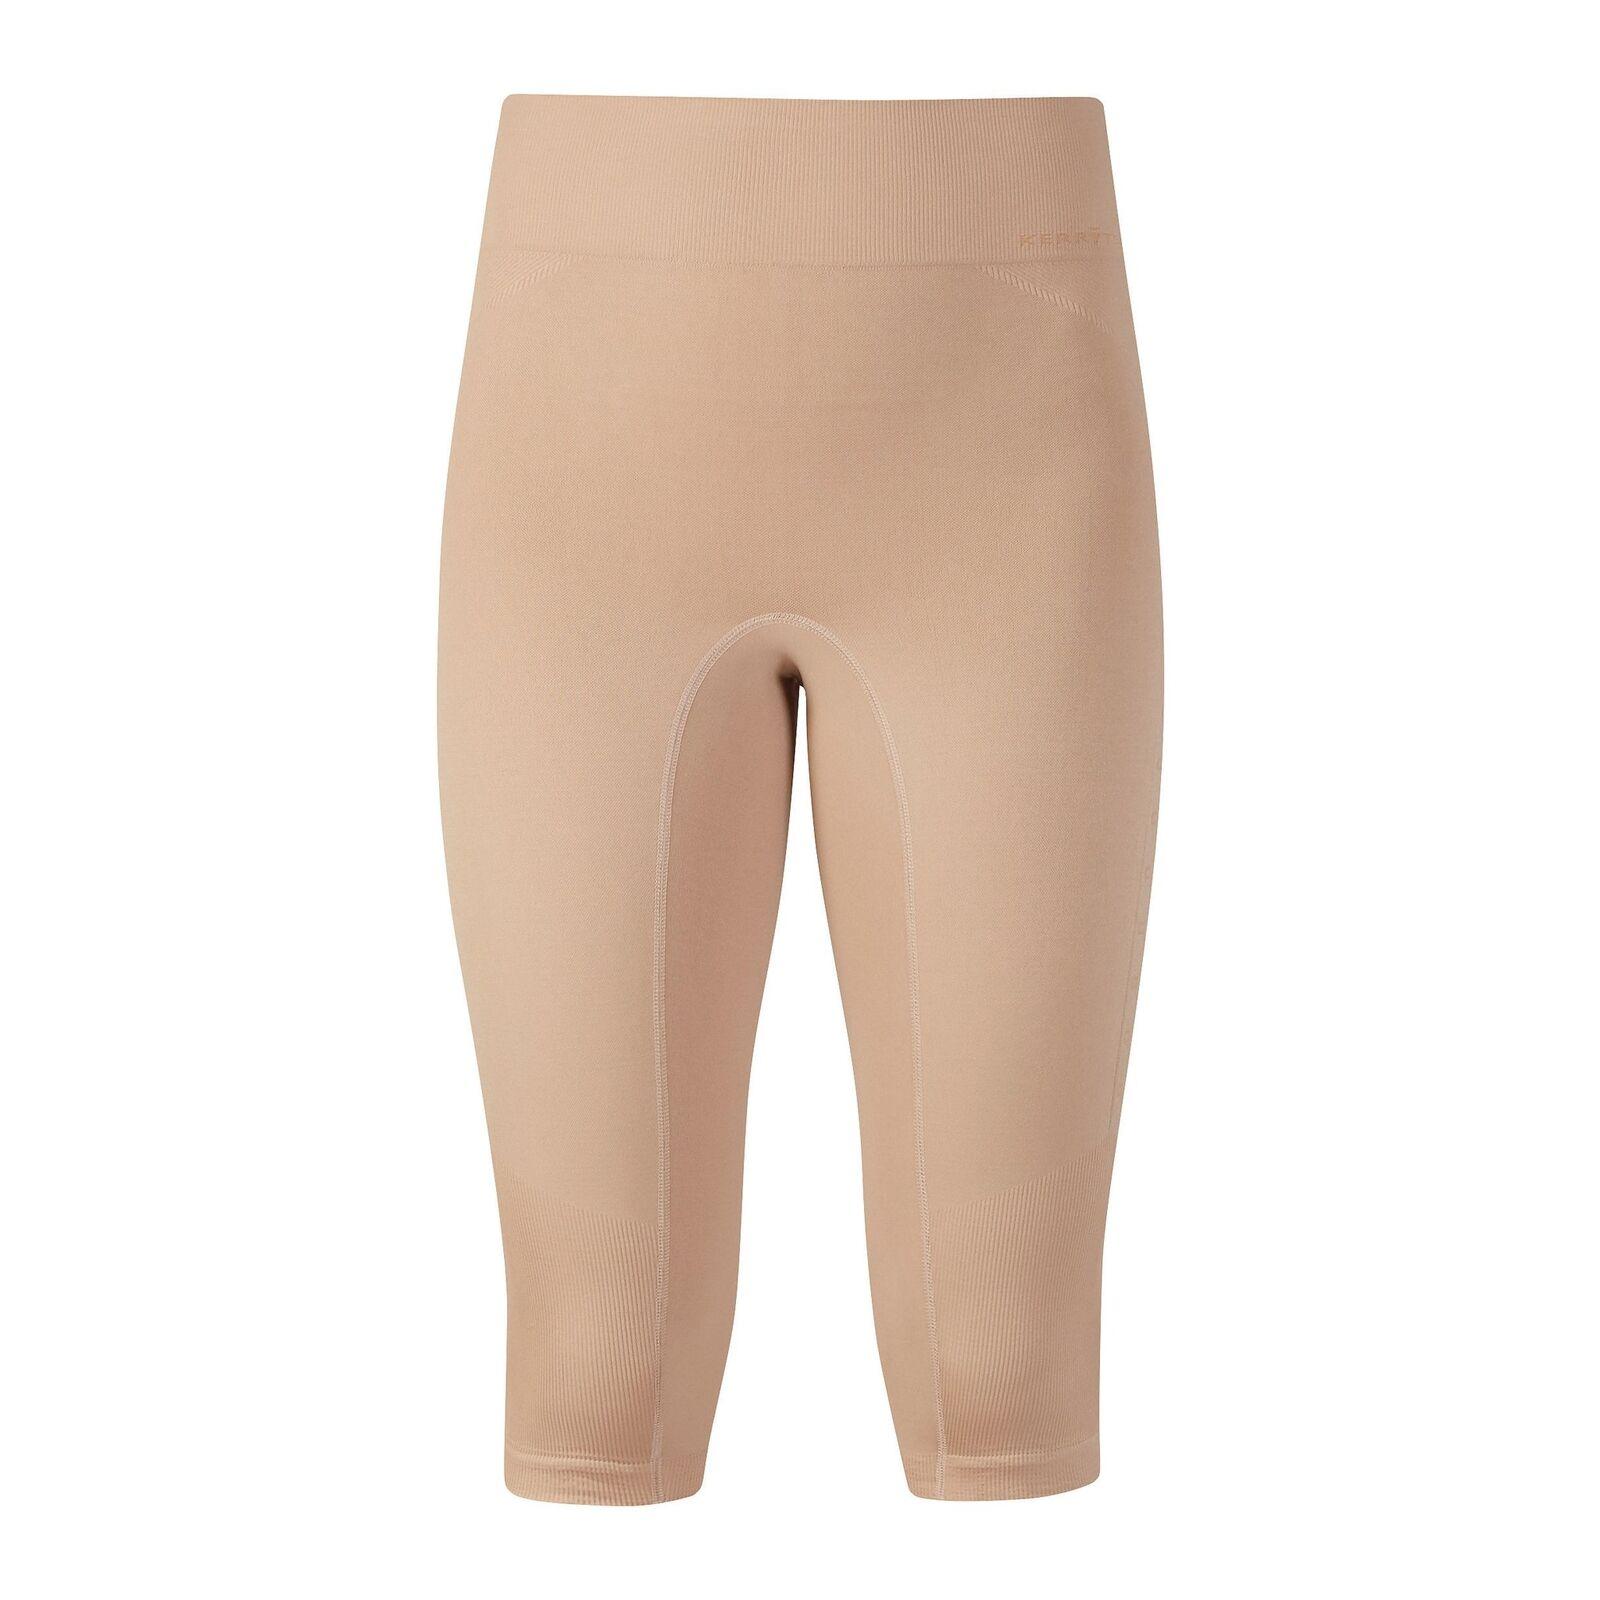 Kerrits, jinete esbelto, Capri, malla, pantalones cortos.